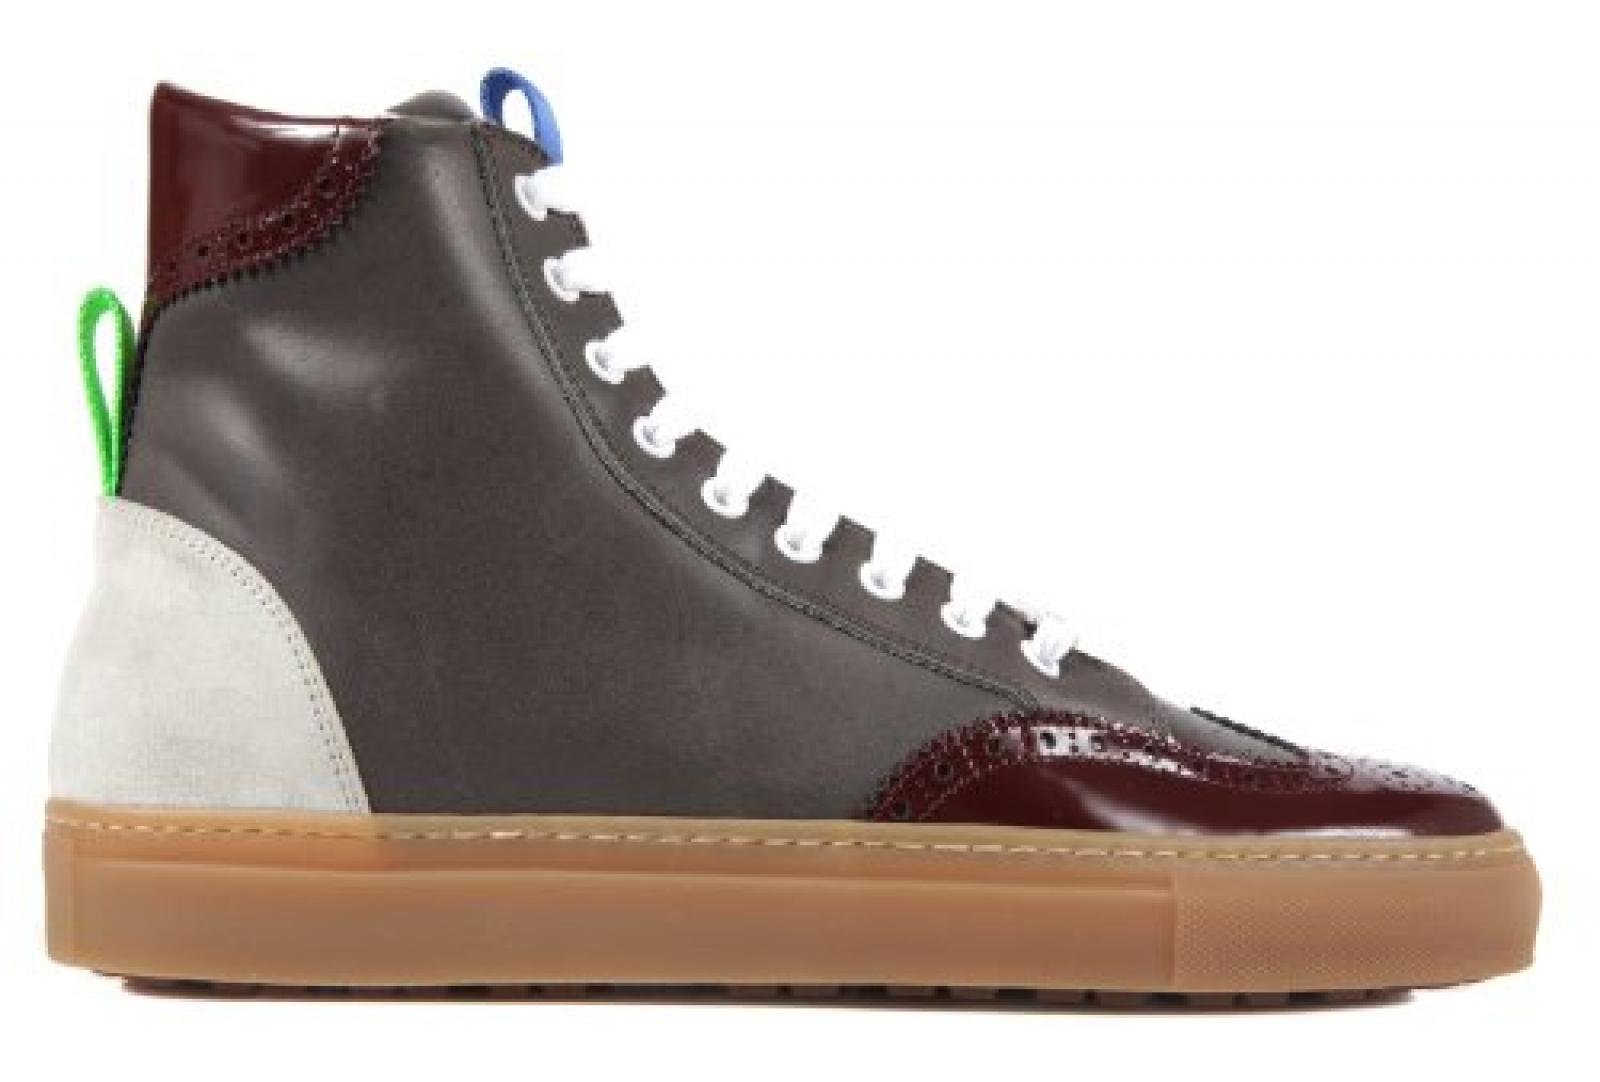 Dsquared2 Dsquared Herrenschuhe Herren Leder Schuhe High Sneakers Grau